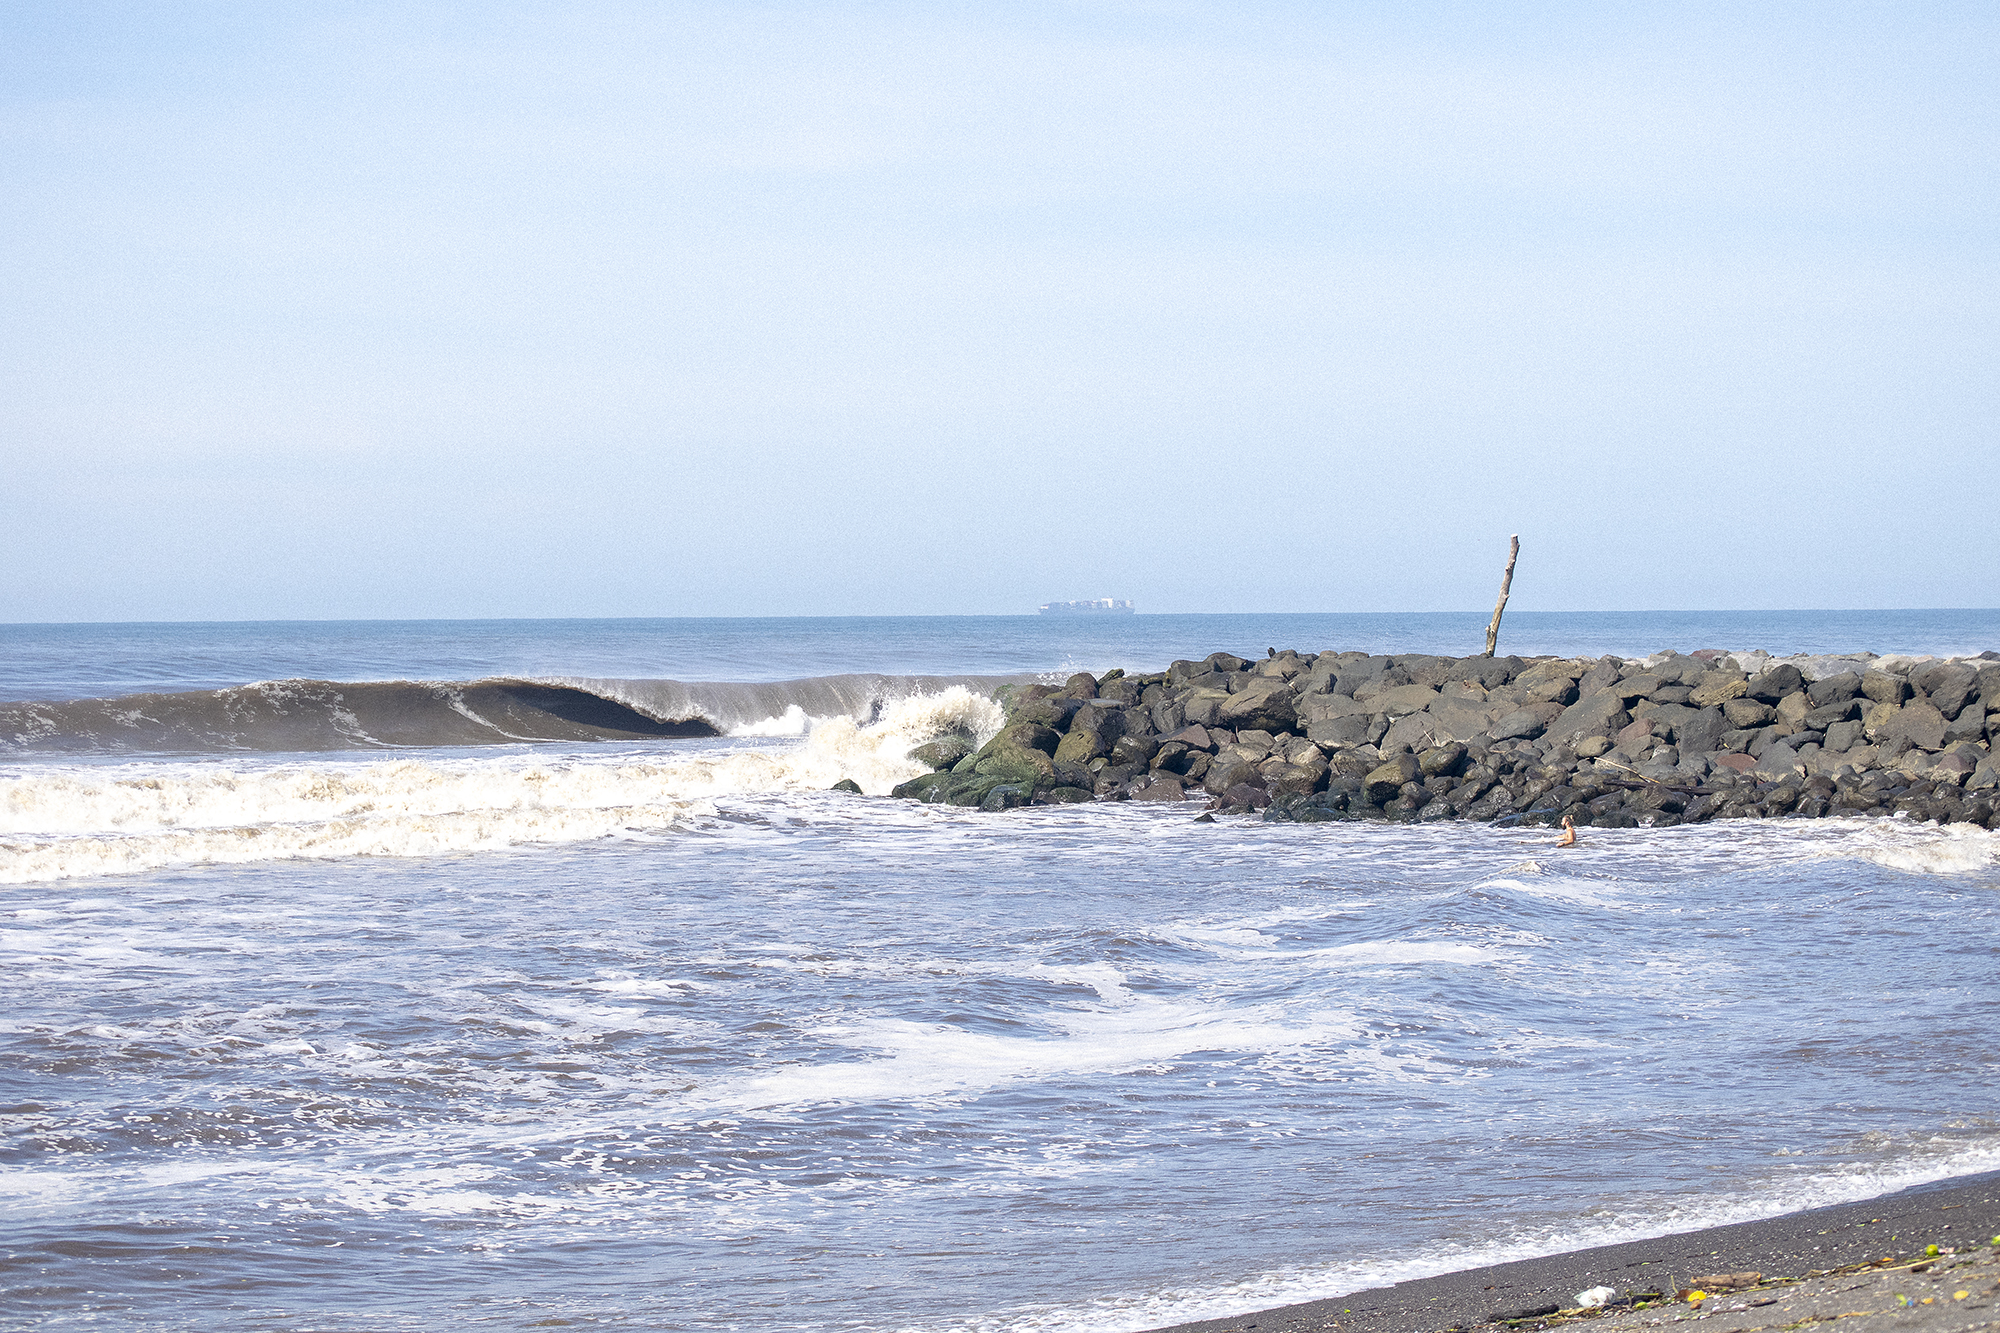 s u r u n c l o u d   w e l c o m e to your new Surf, Travel ... 7d9bd683adc